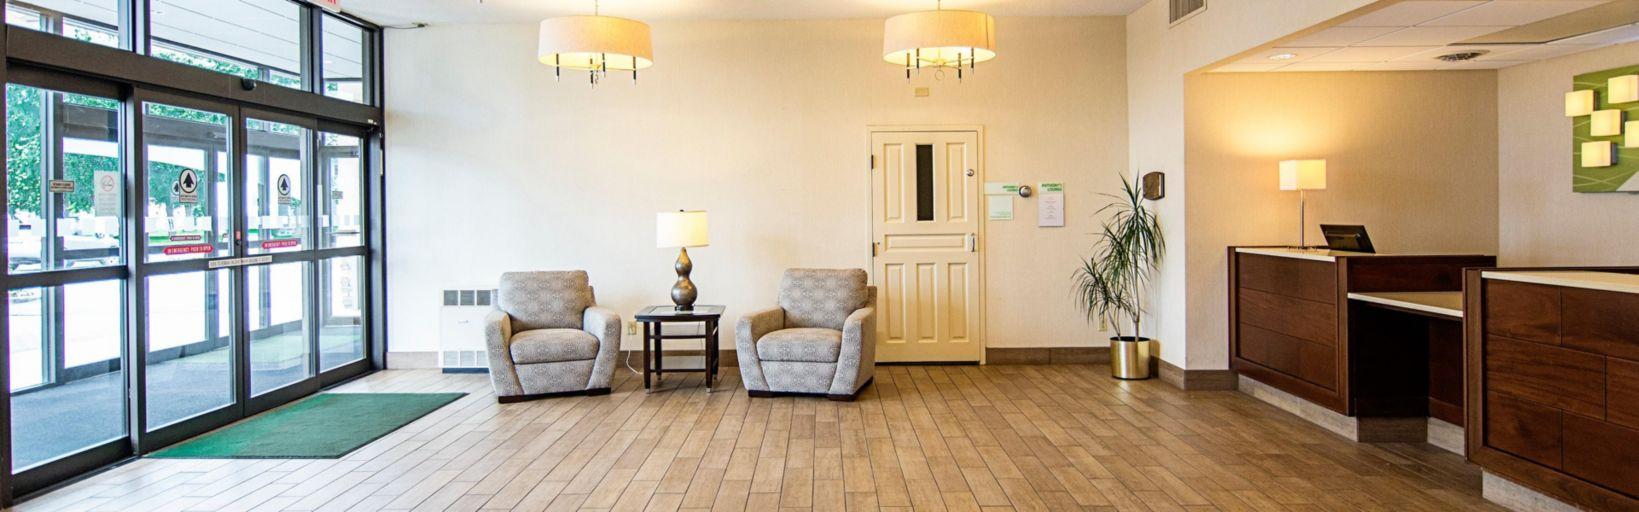 Holiday Inn Elmira Riverview Hotel By Ihg